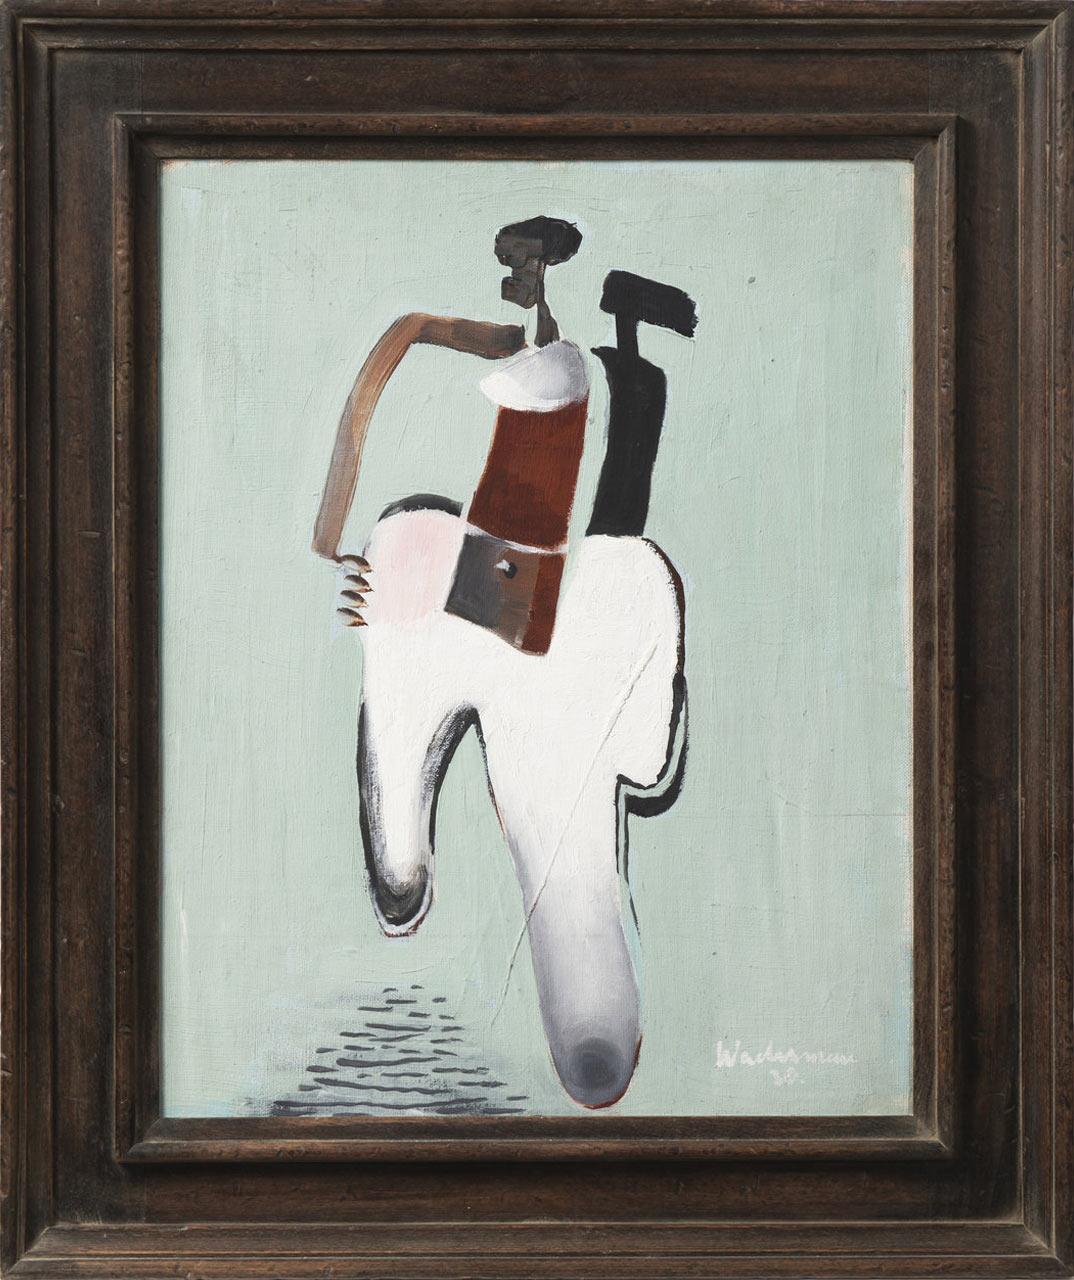 arthouse-hejtmanek-alois-wachsman-figura-01